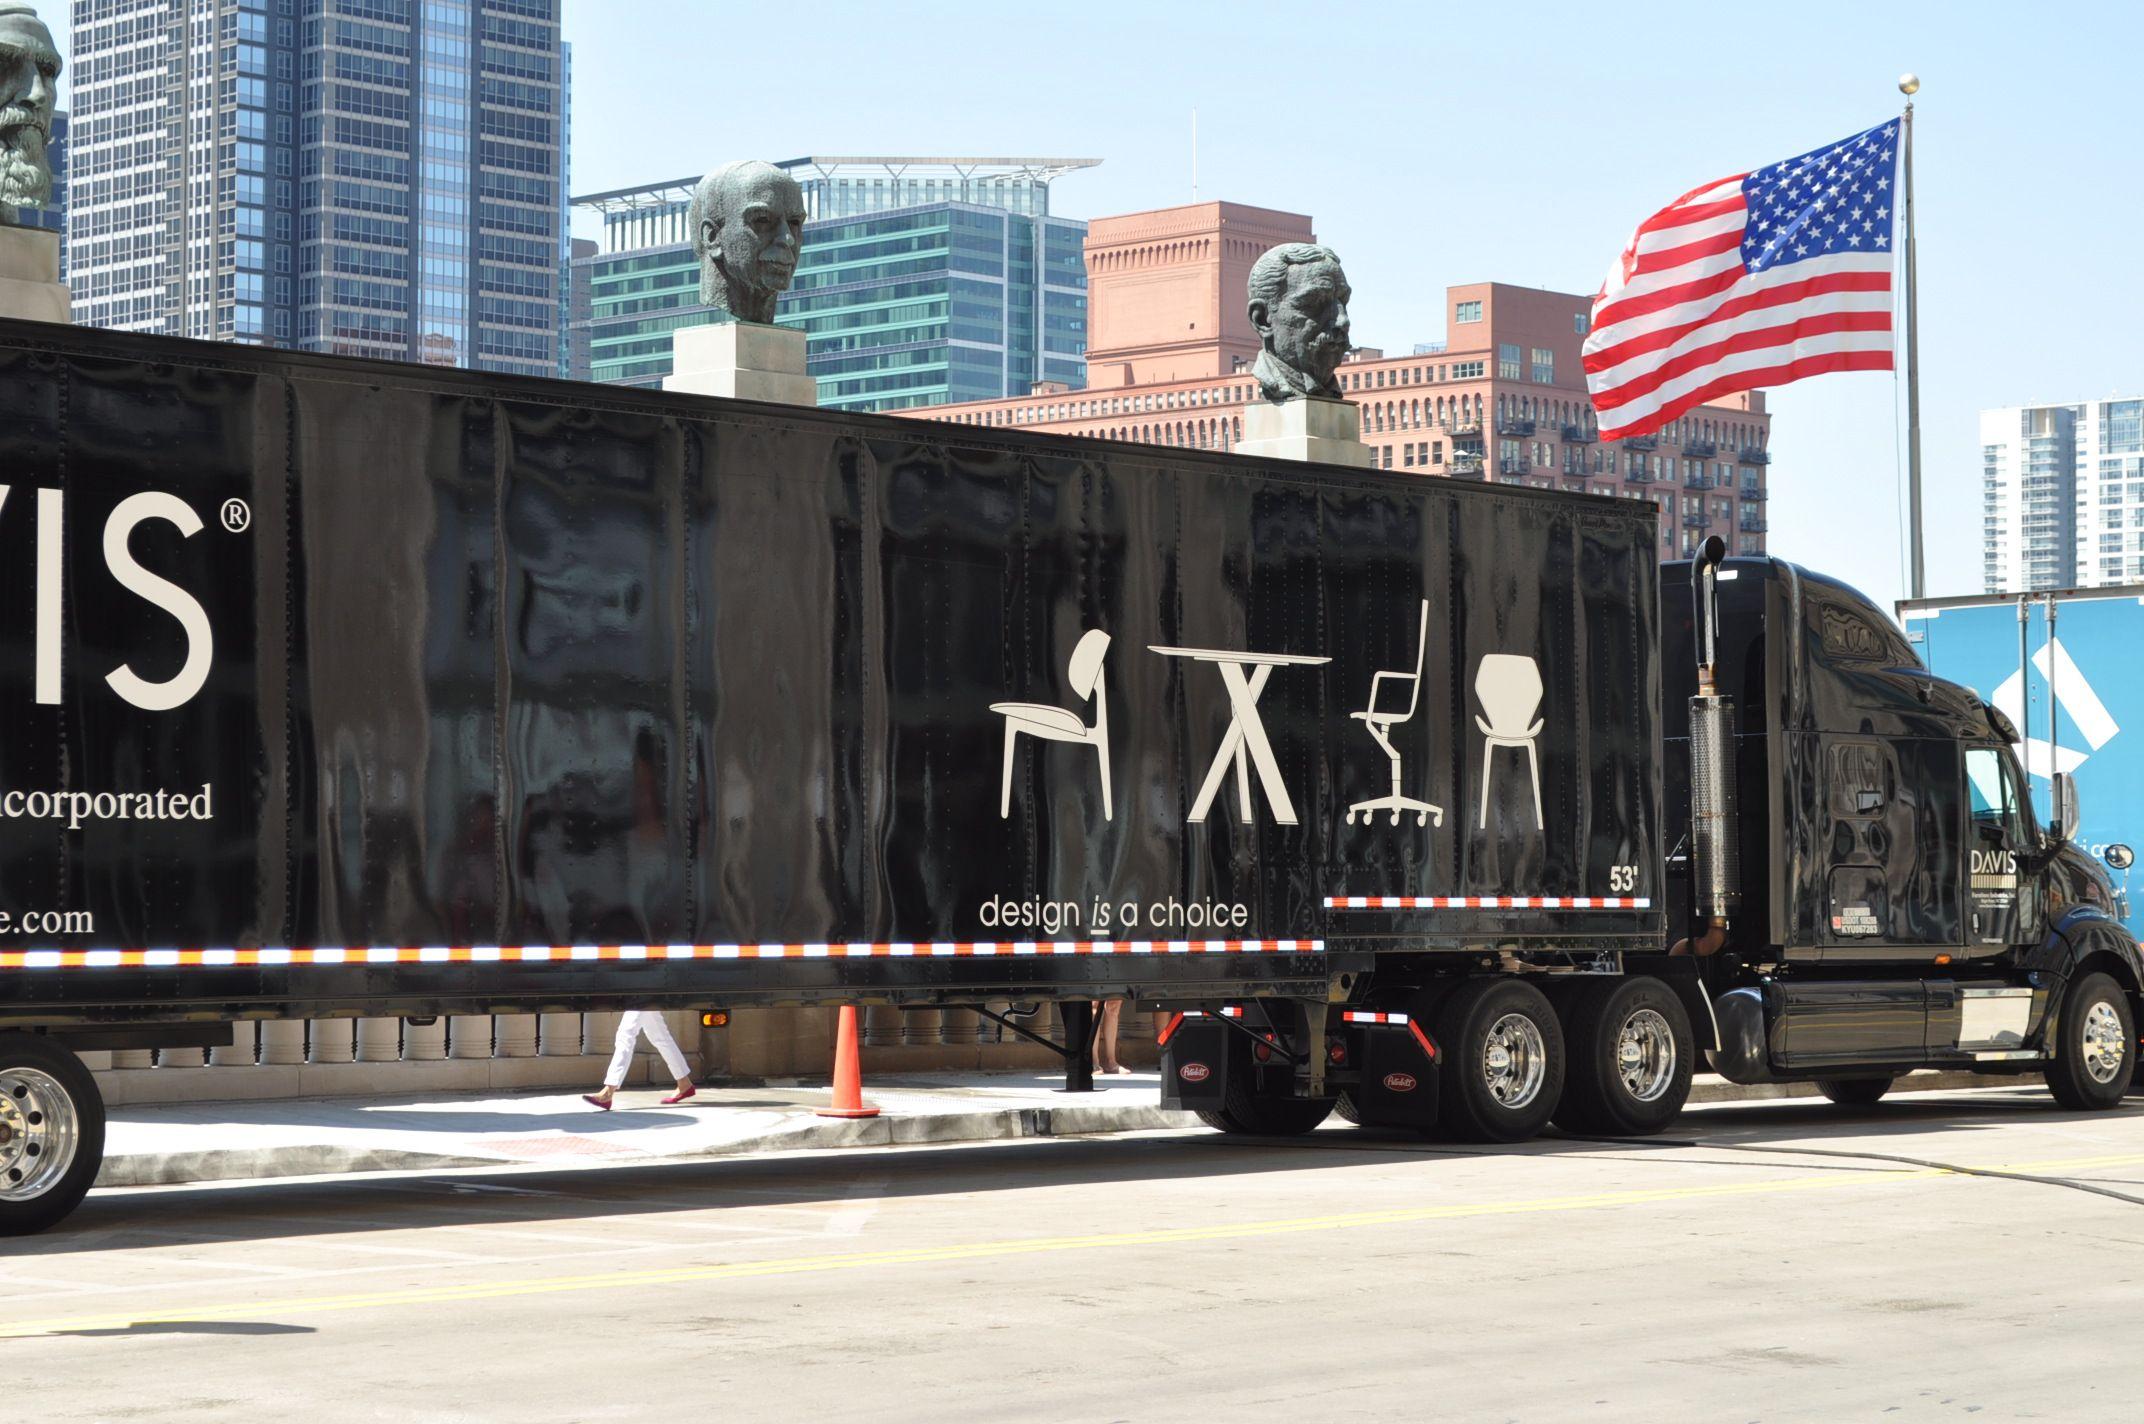 Davis Furniture Truck outside the Merchandise Mart during NeoCon12